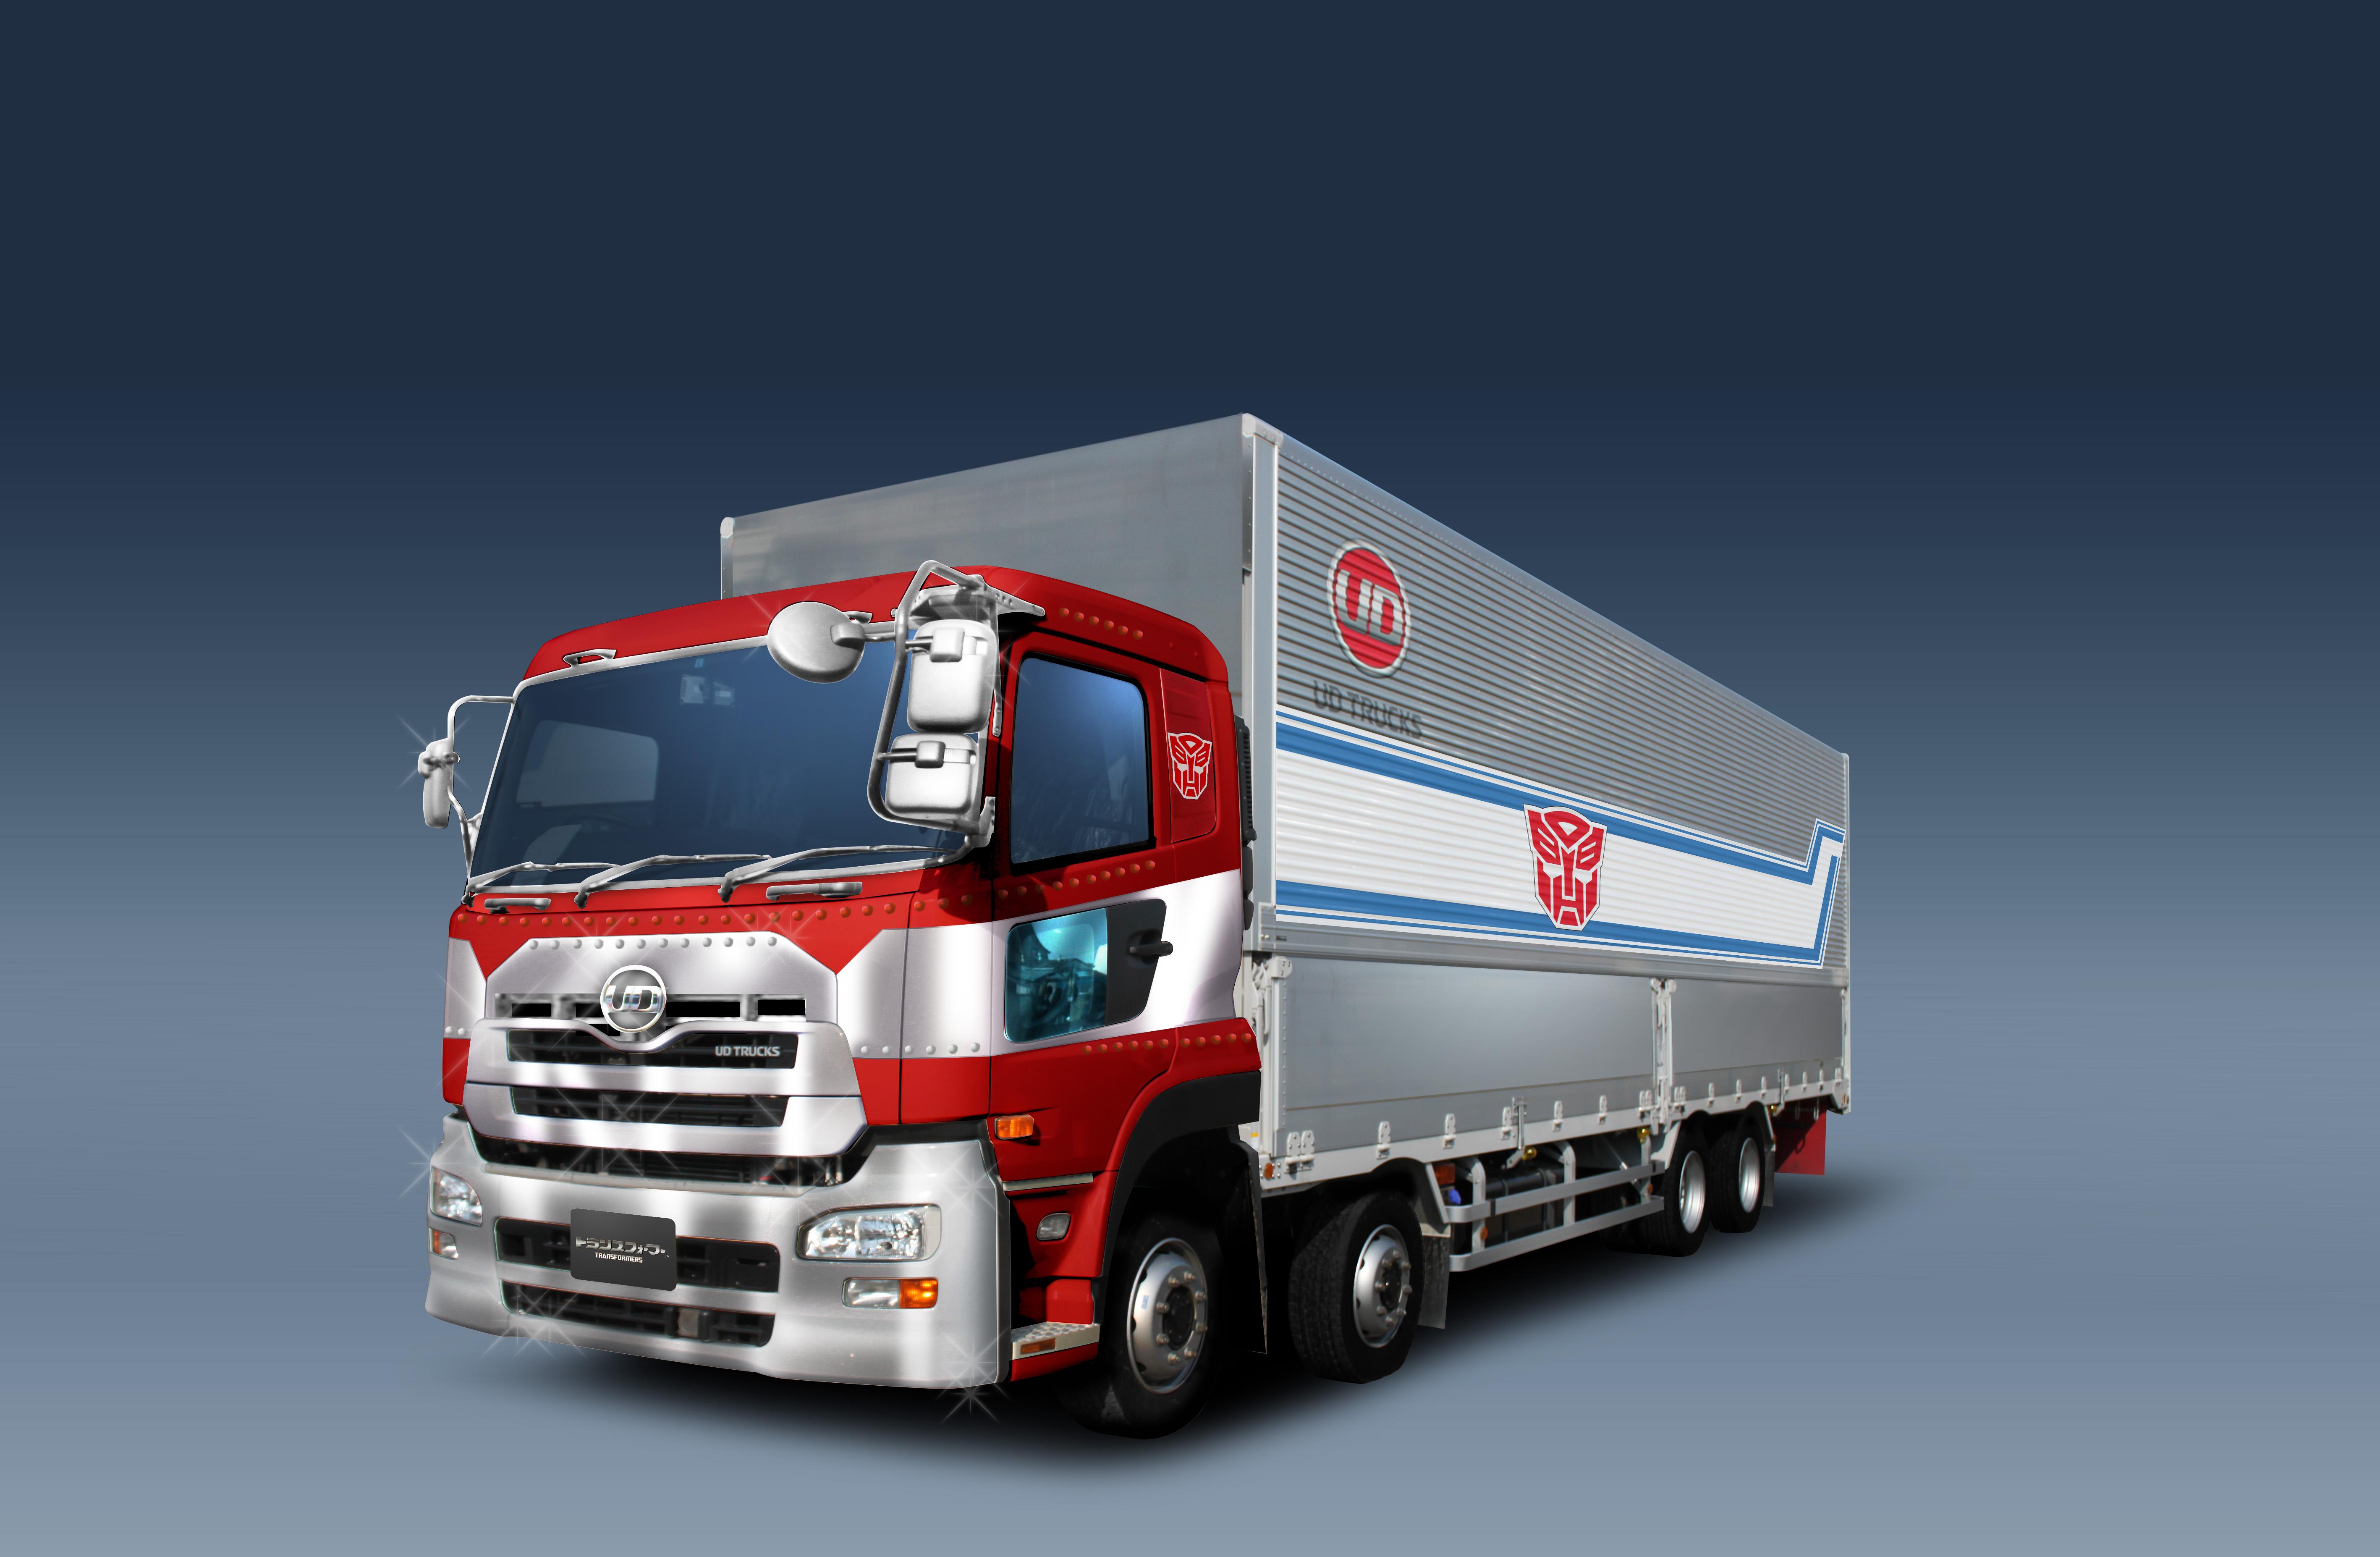 transformers-takaratomy-30th-anniversary-optimus-prime-semi